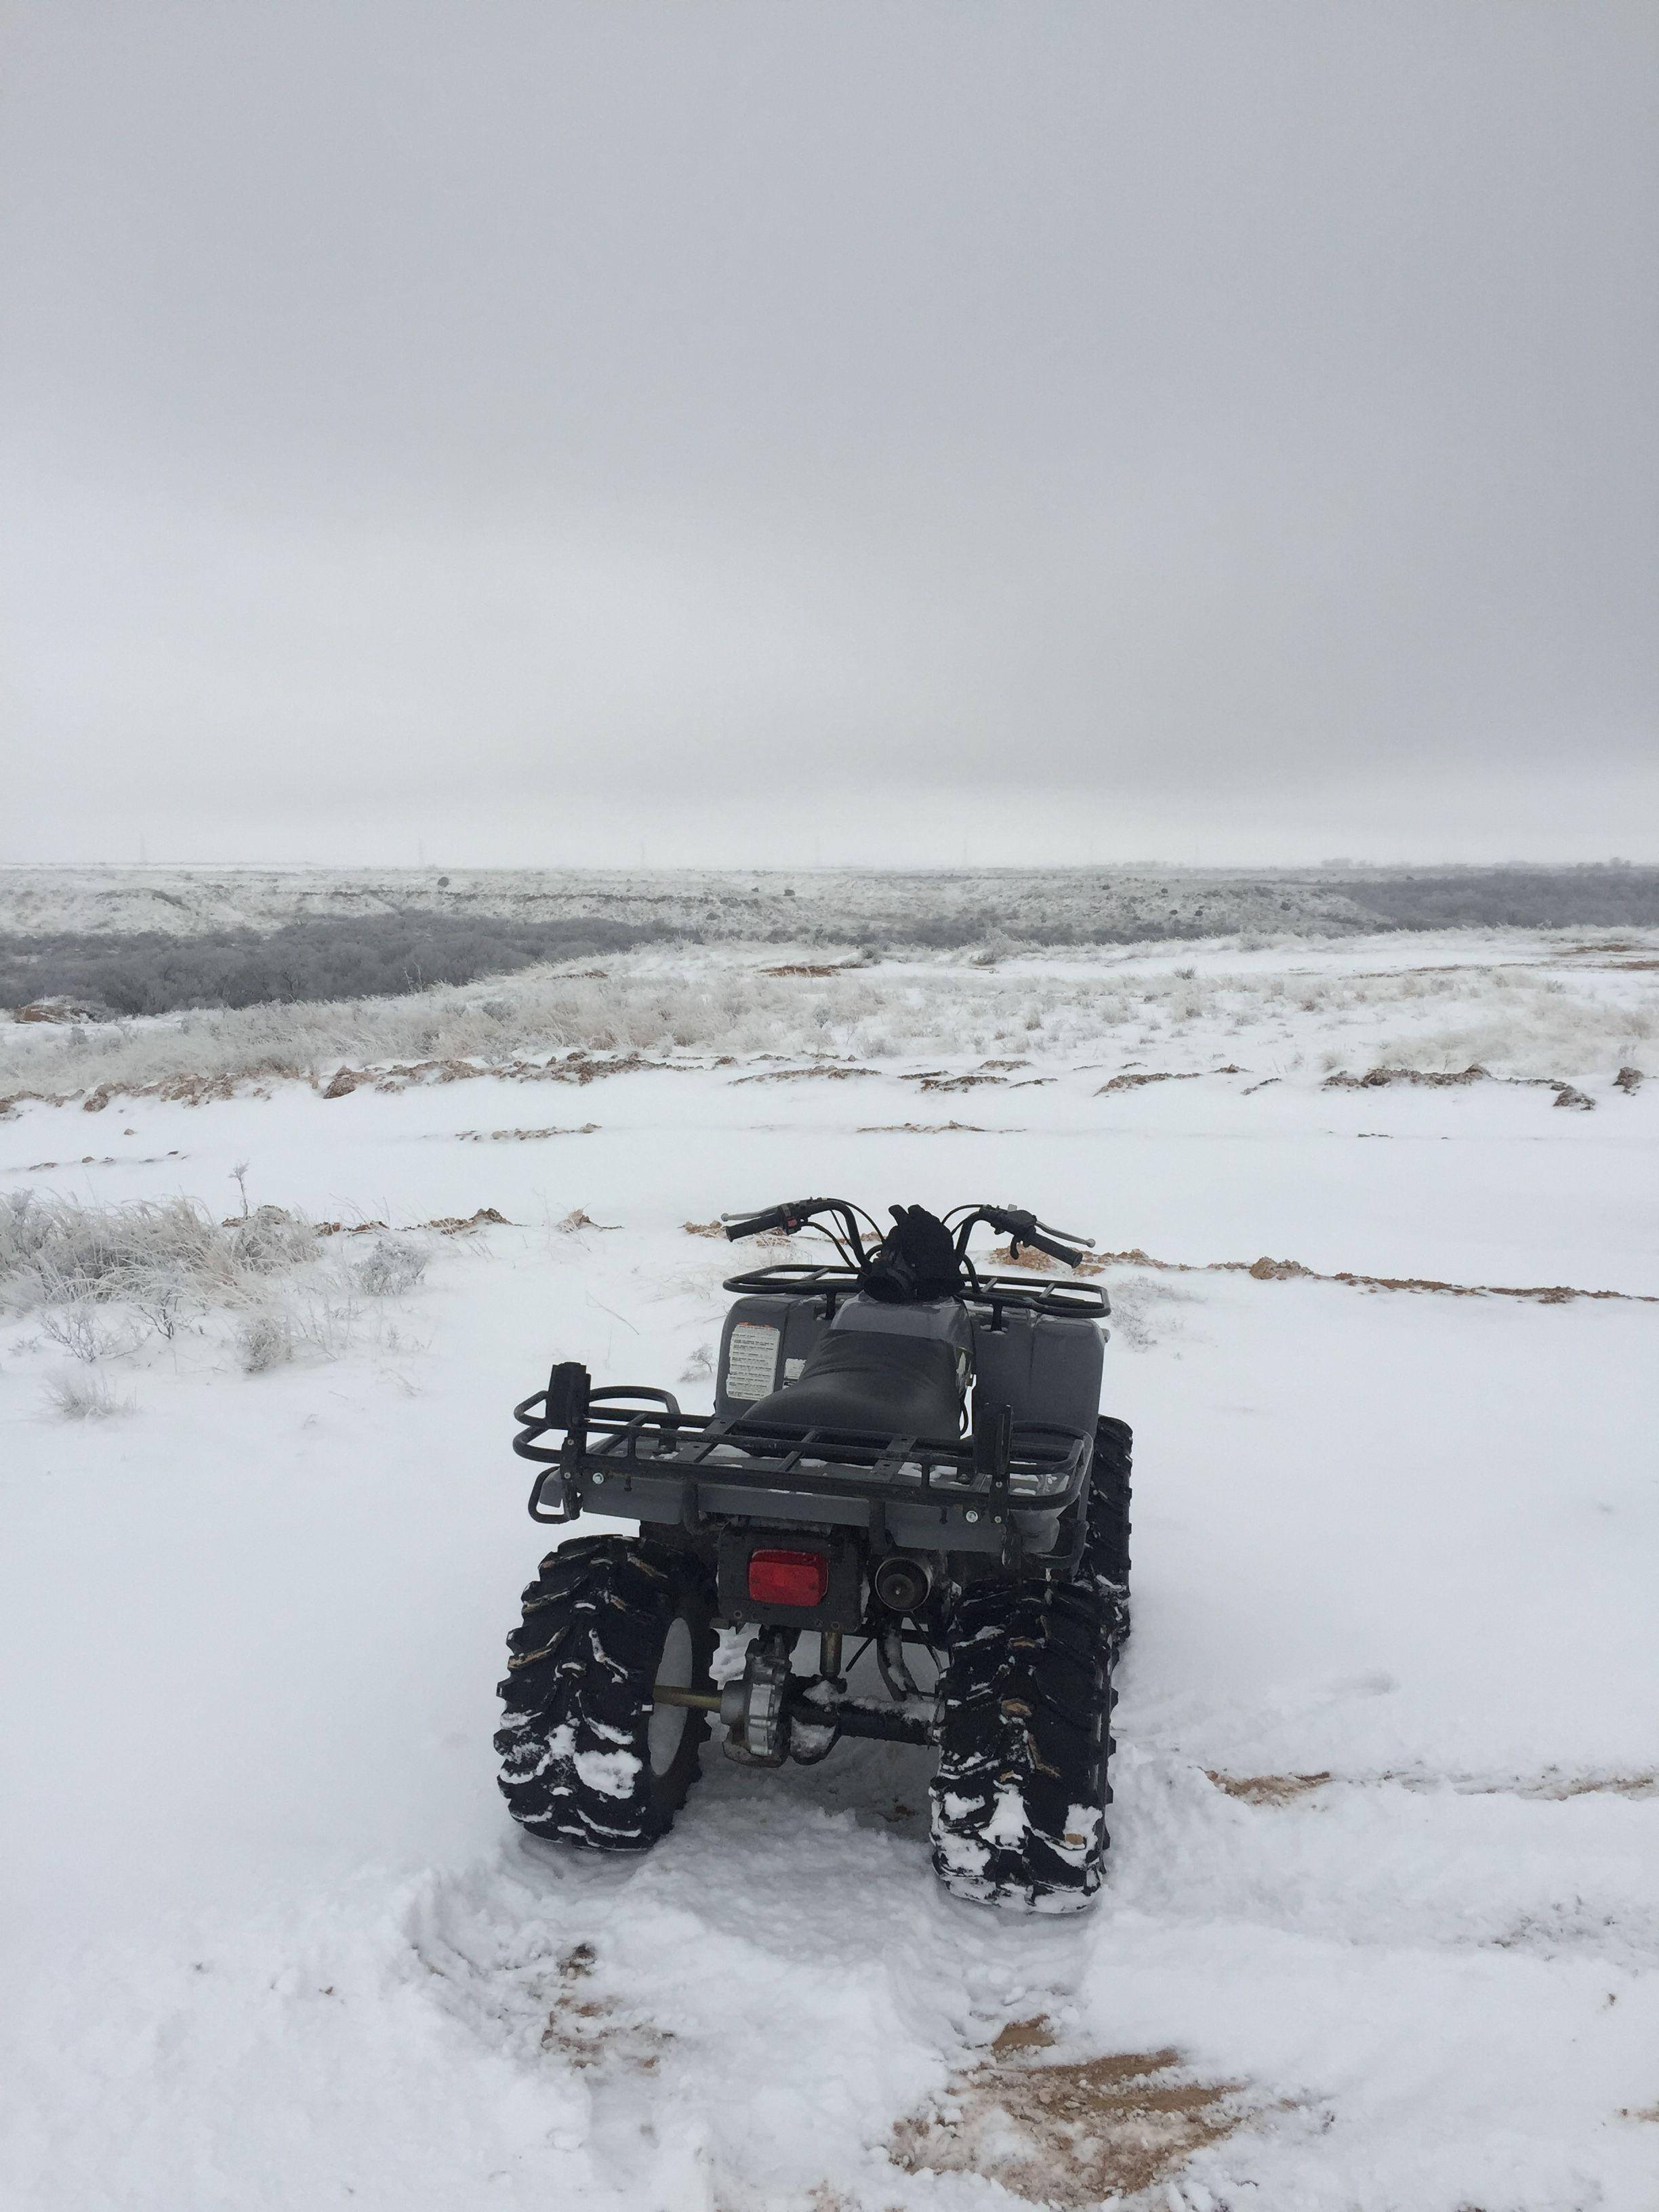 92 Yamaha Timberwolf Snow Day Fun In T X Military Vehicles Yamaha Atv